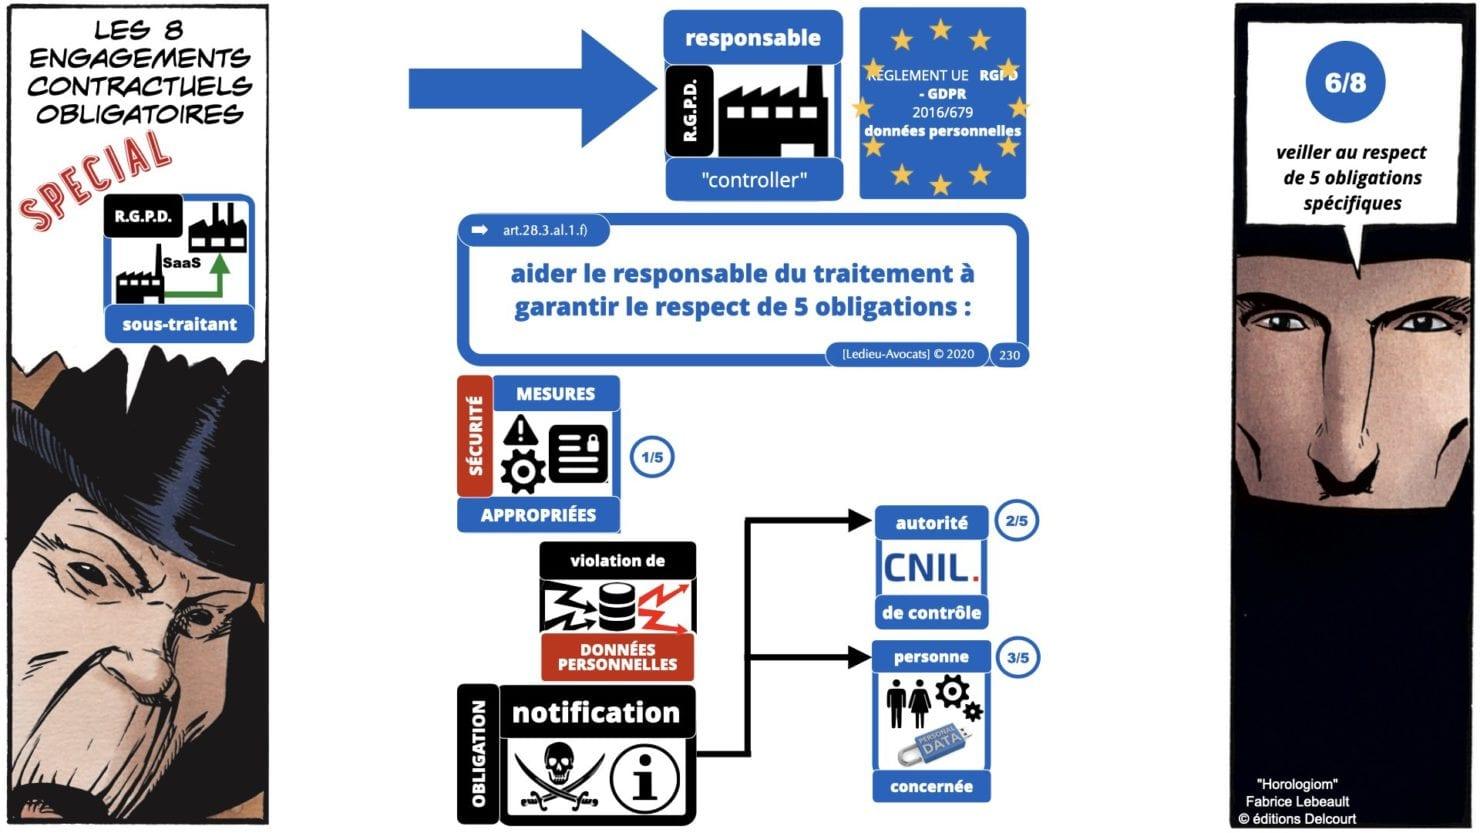 RGPD e-Privacy principes actualité jurisprudence ©Ledieu-Avocats 25-06-2021.230